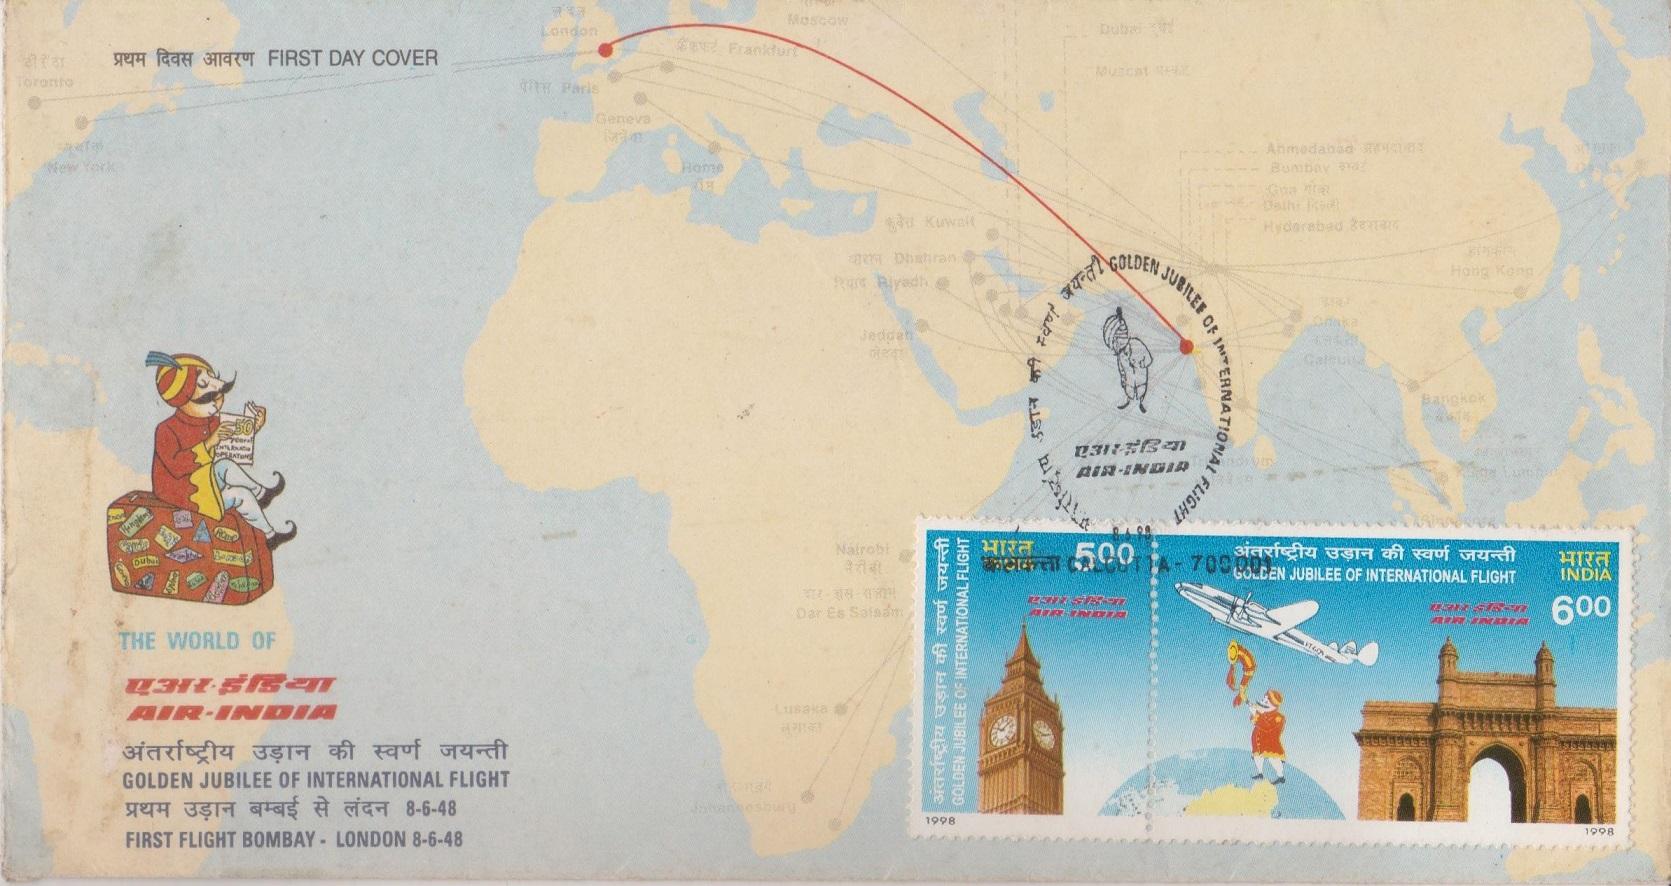 First Flight Bombay - London 8-6-48